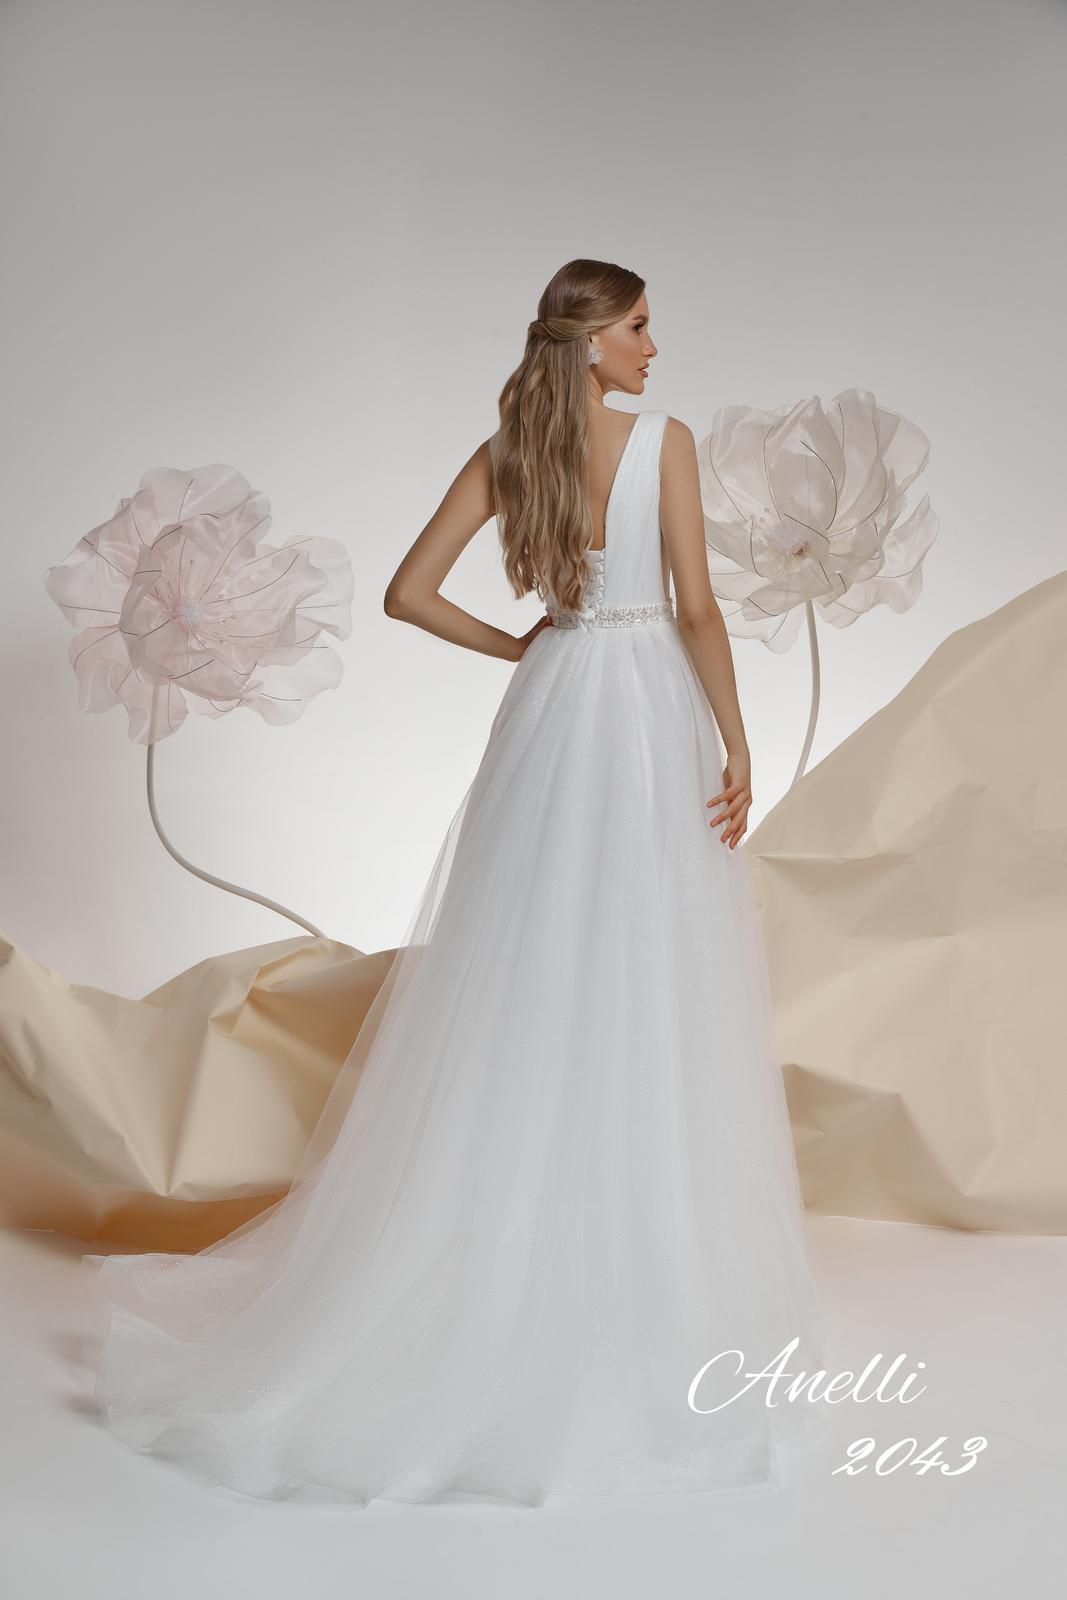 Svadobné šaty - Imagine 2043 - Obrázok č. 4